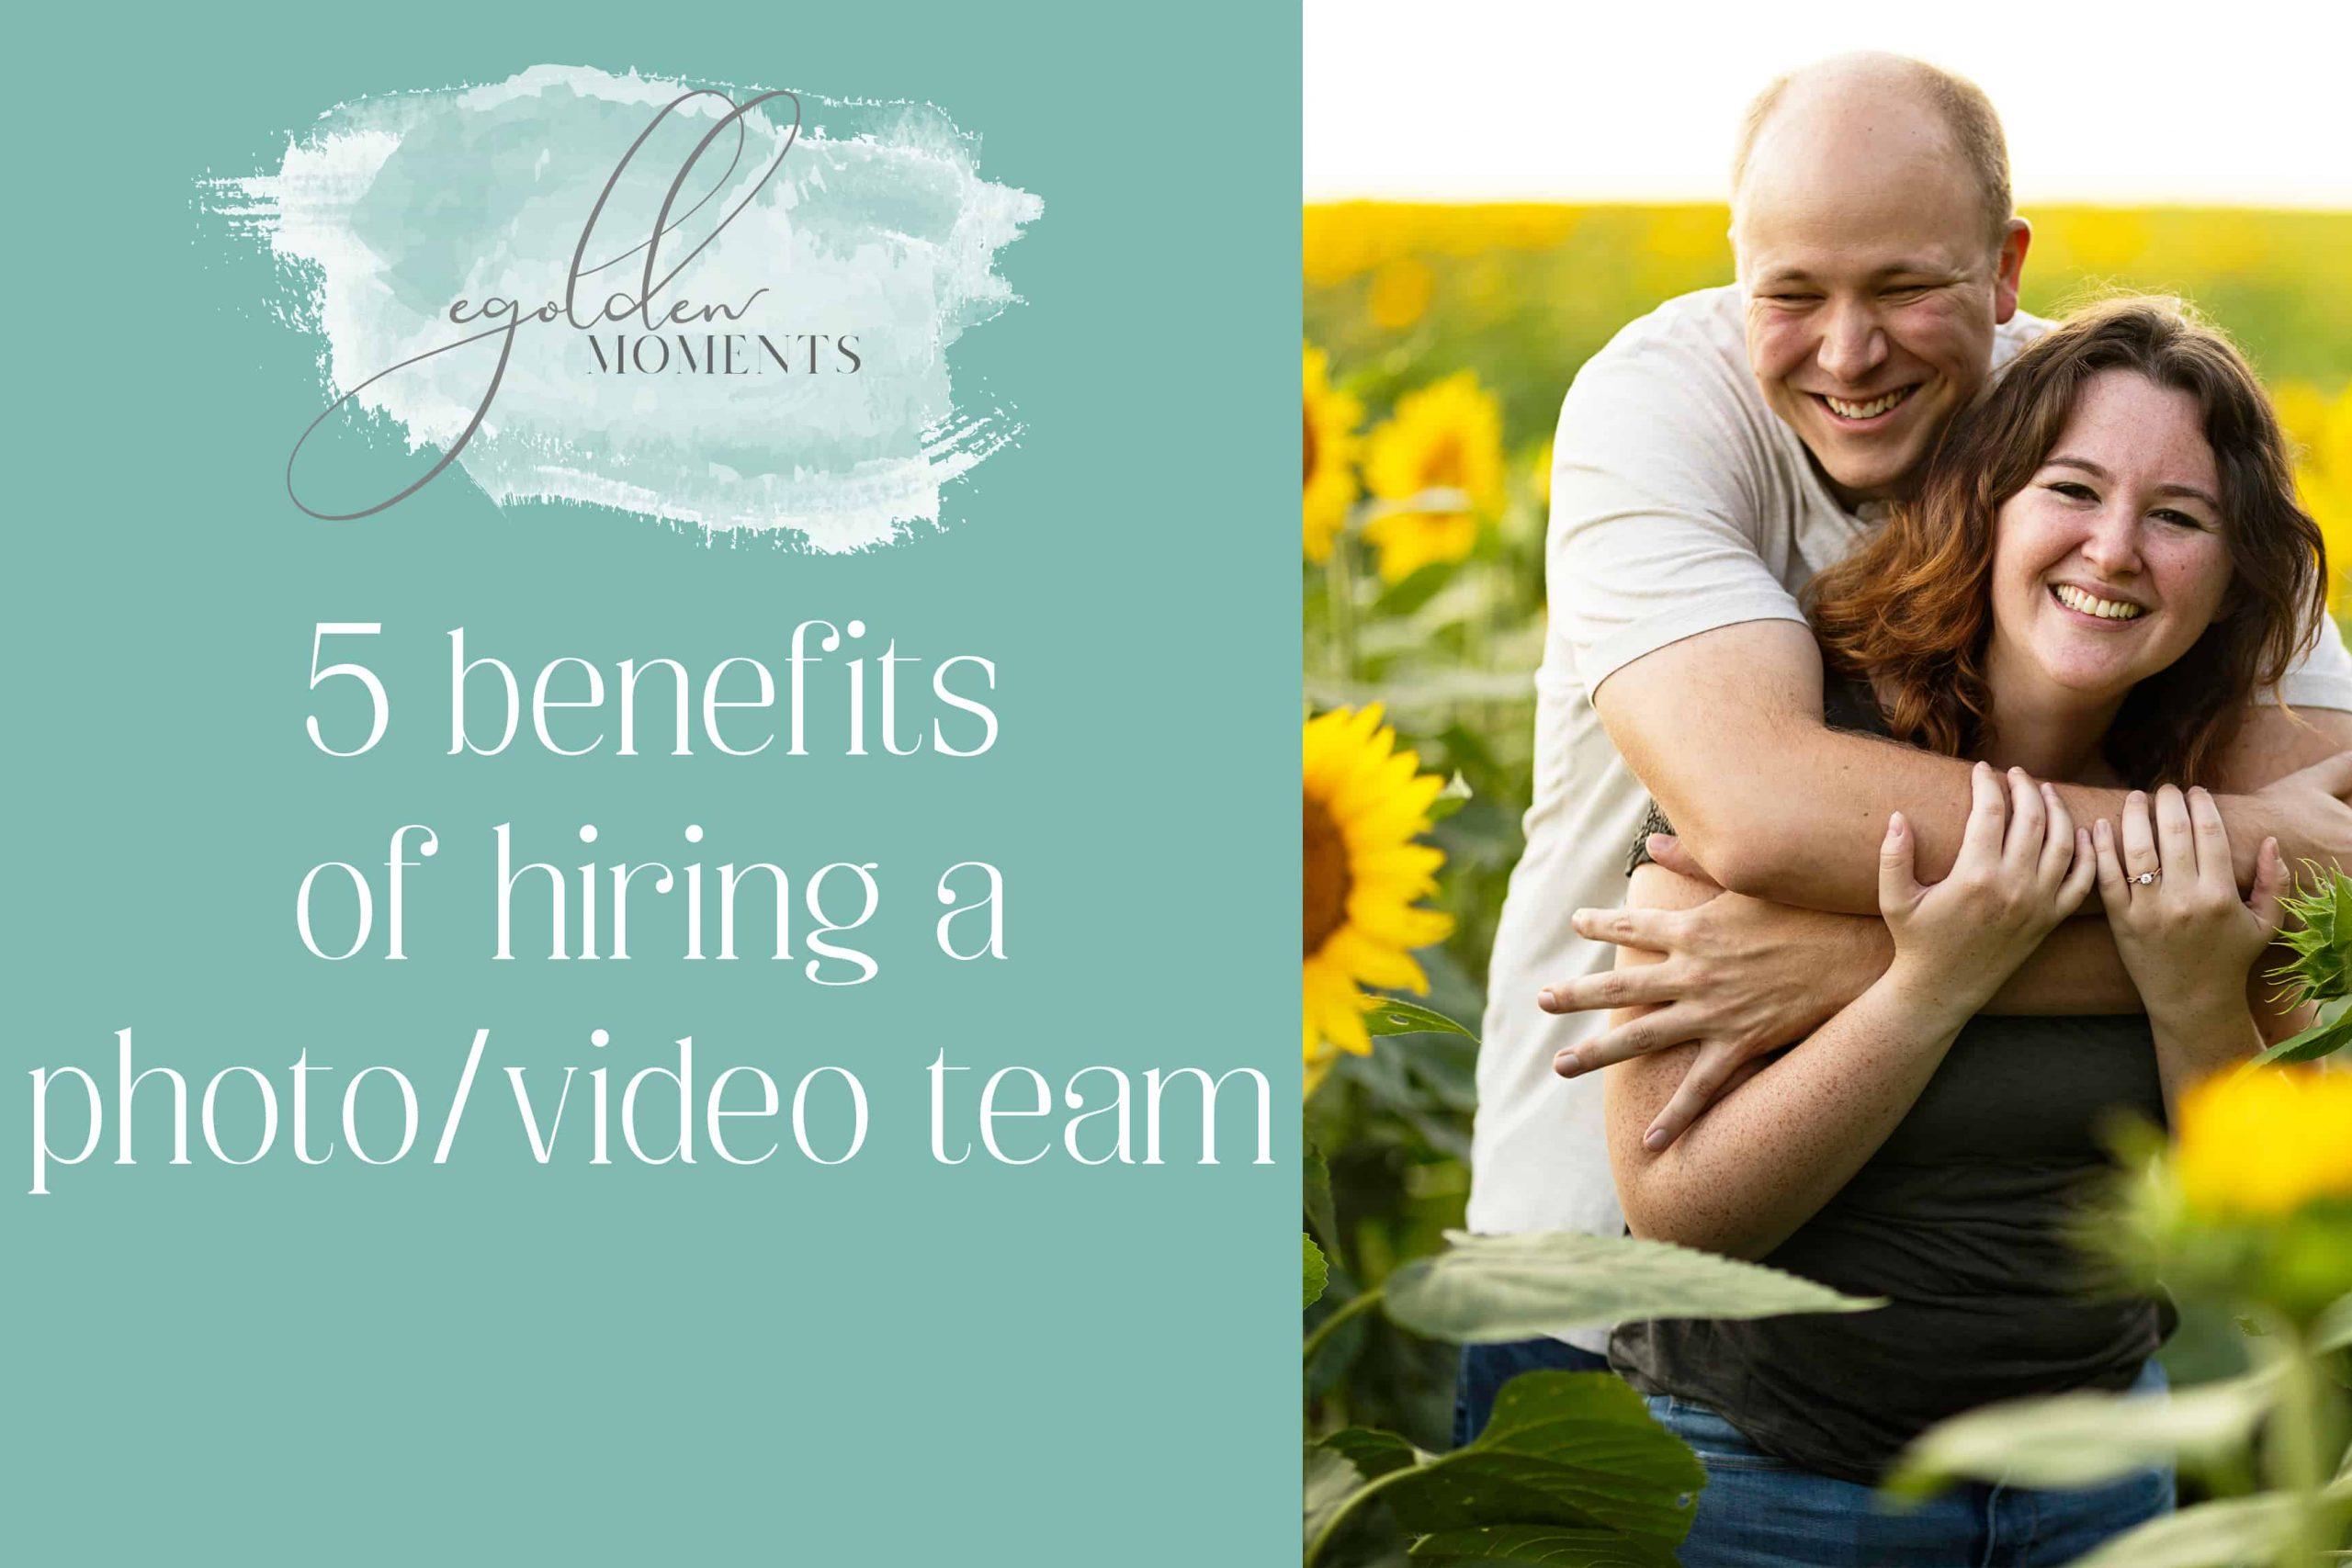 benefits of hiring a photo/video team